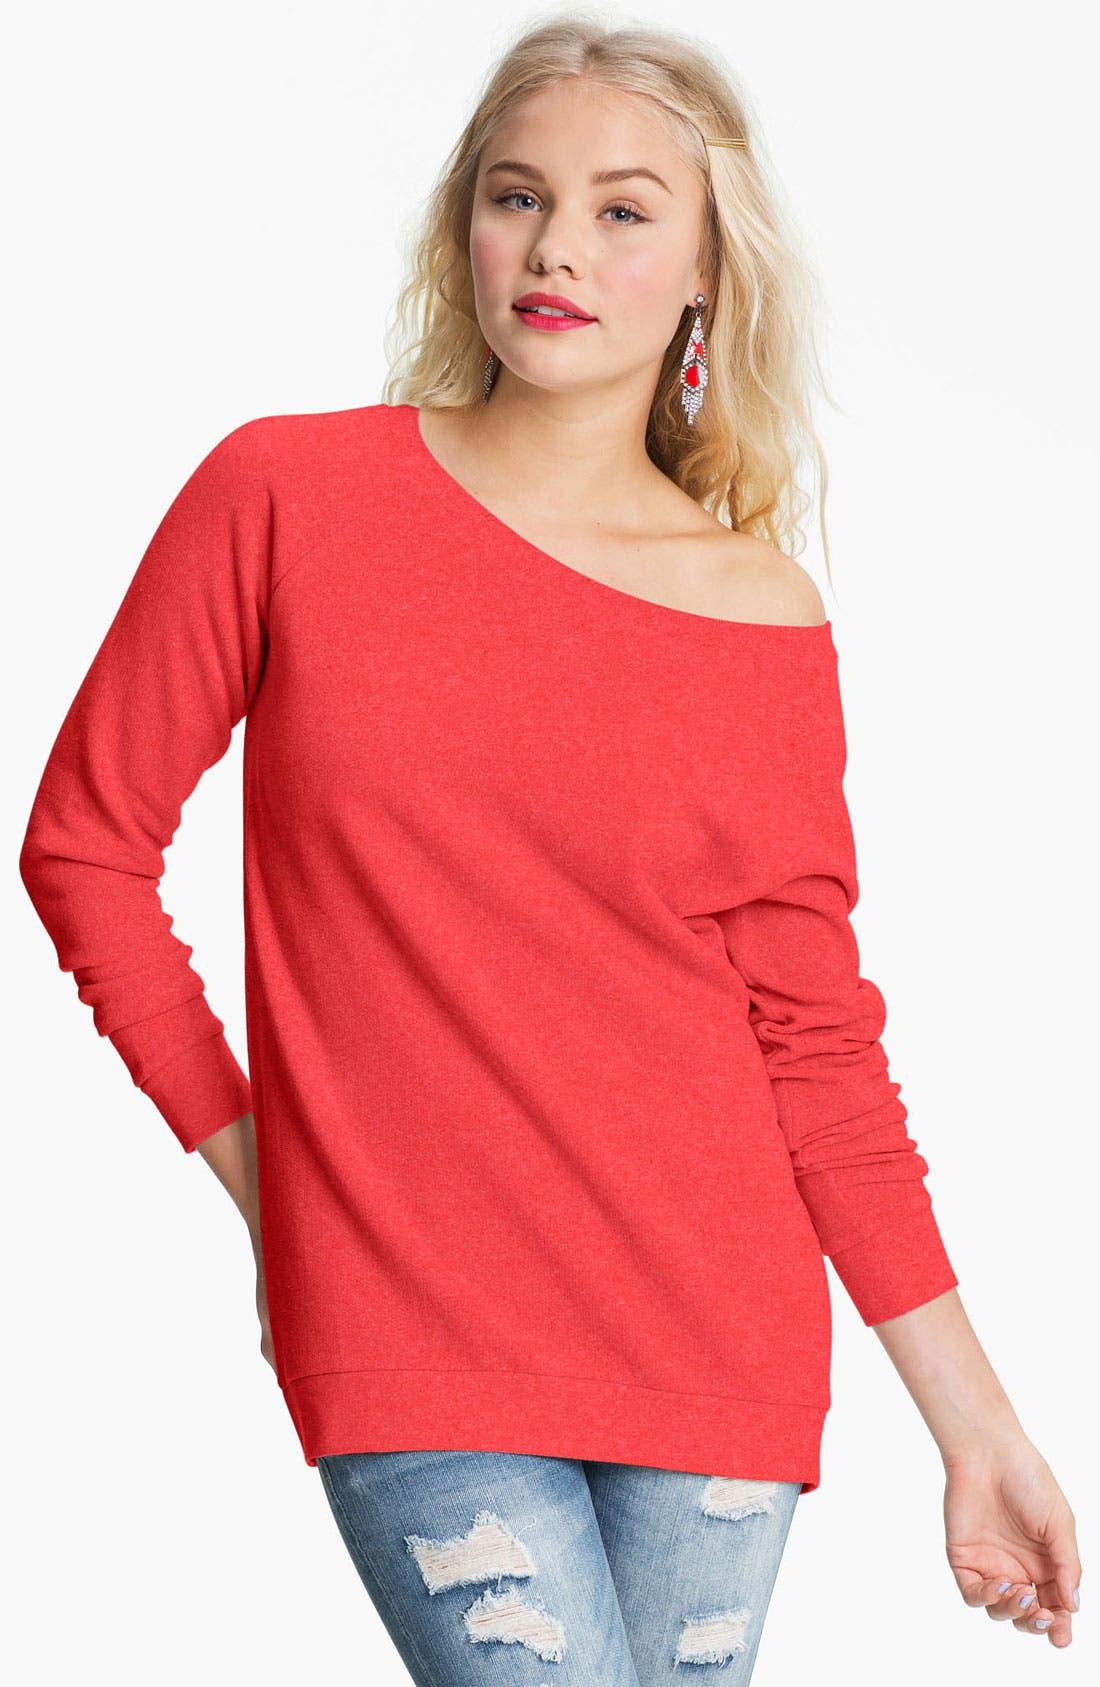 Alternate Image 1 Selected - Rubbish® Off Shoulder Sweatshirt (Juniors)